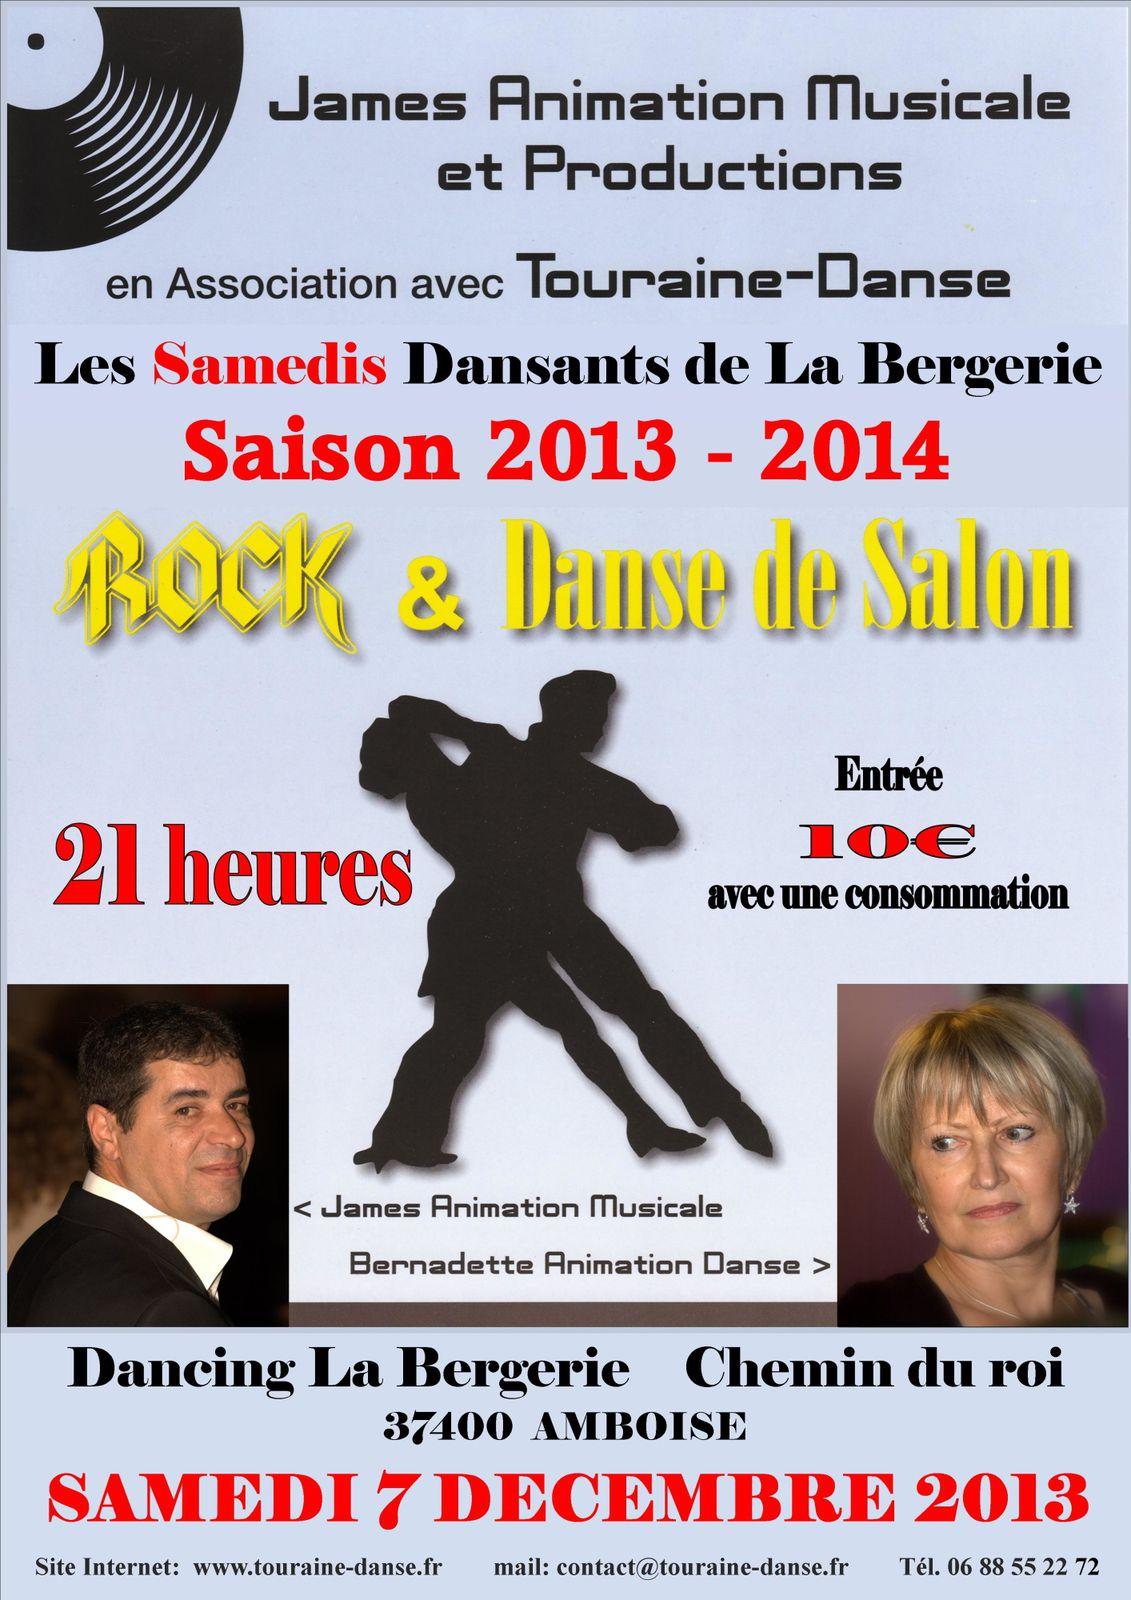 SAMEDI-7-DECEMBRE-2013-TOURAINE-DANSE-AU-DANCING-LA-BERGERI.jpg